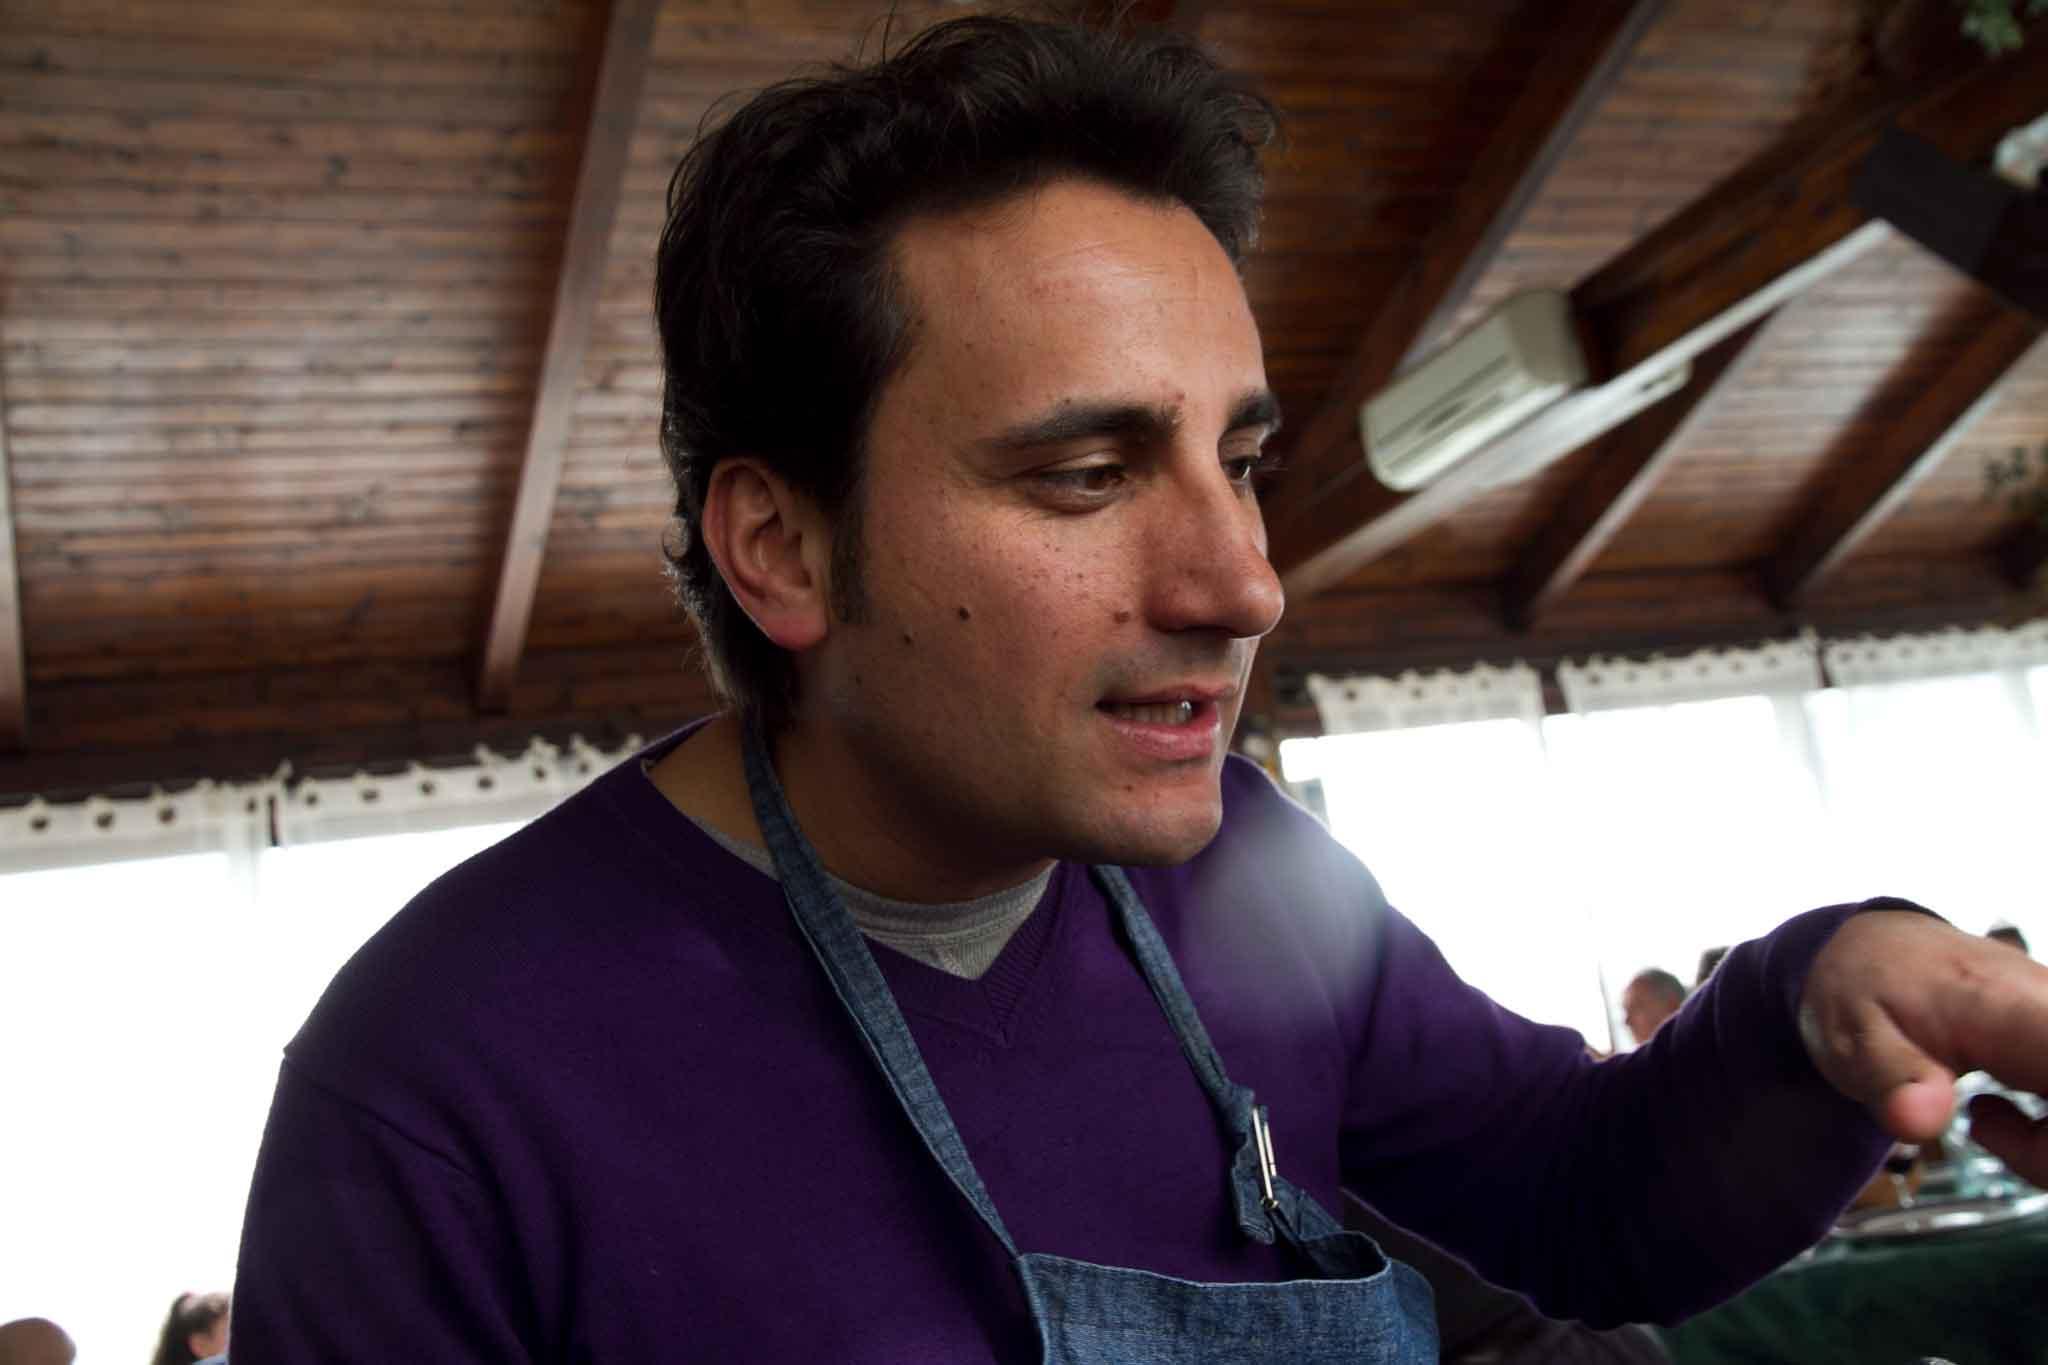 Manuel Lombardi